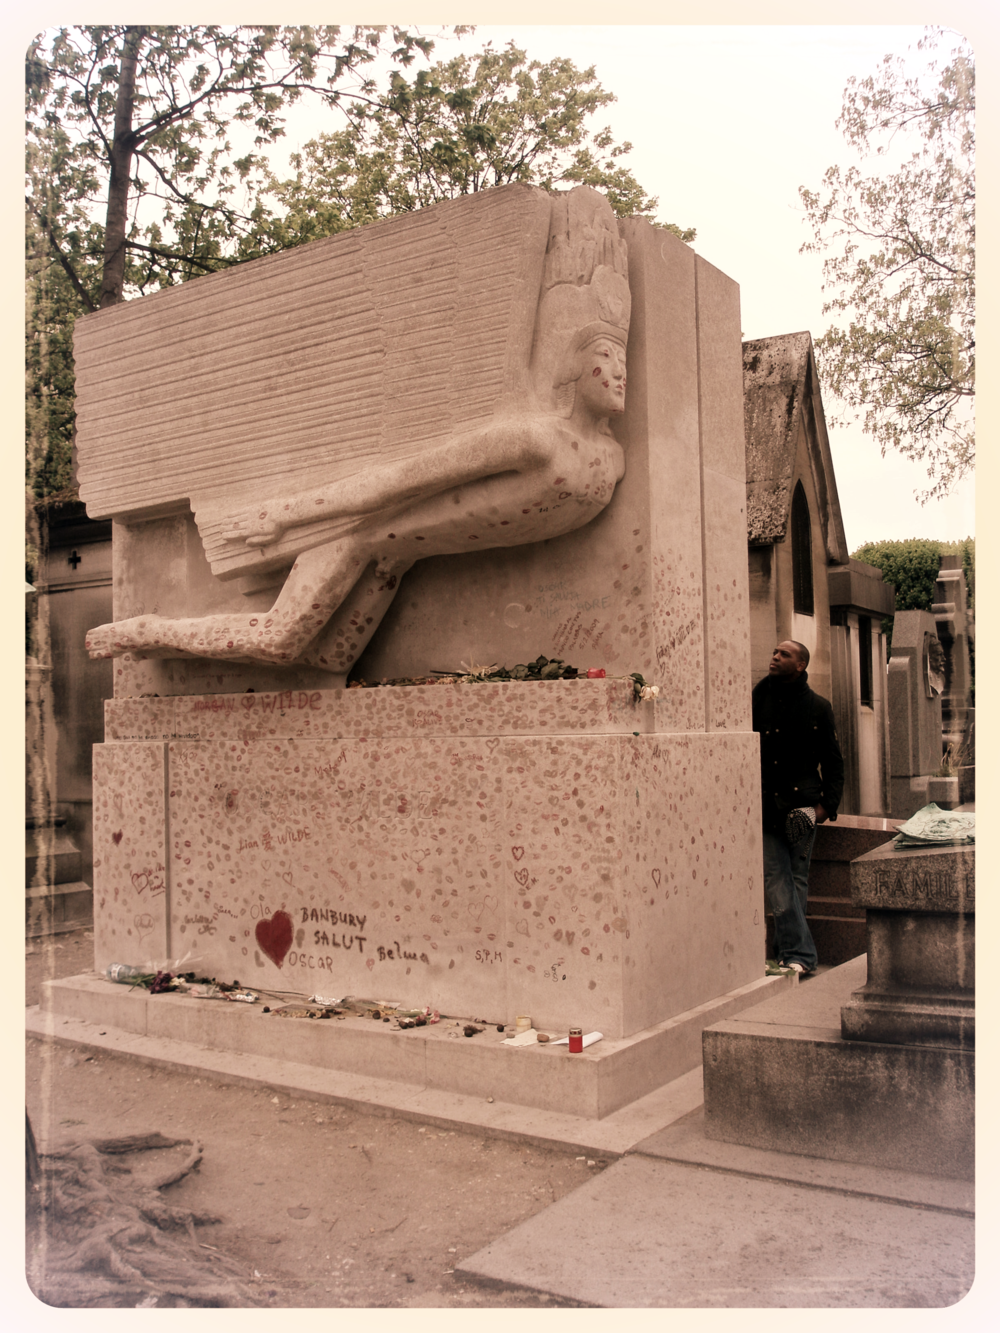 Oscar Wilde's grave at Père Lachaise Cemetery